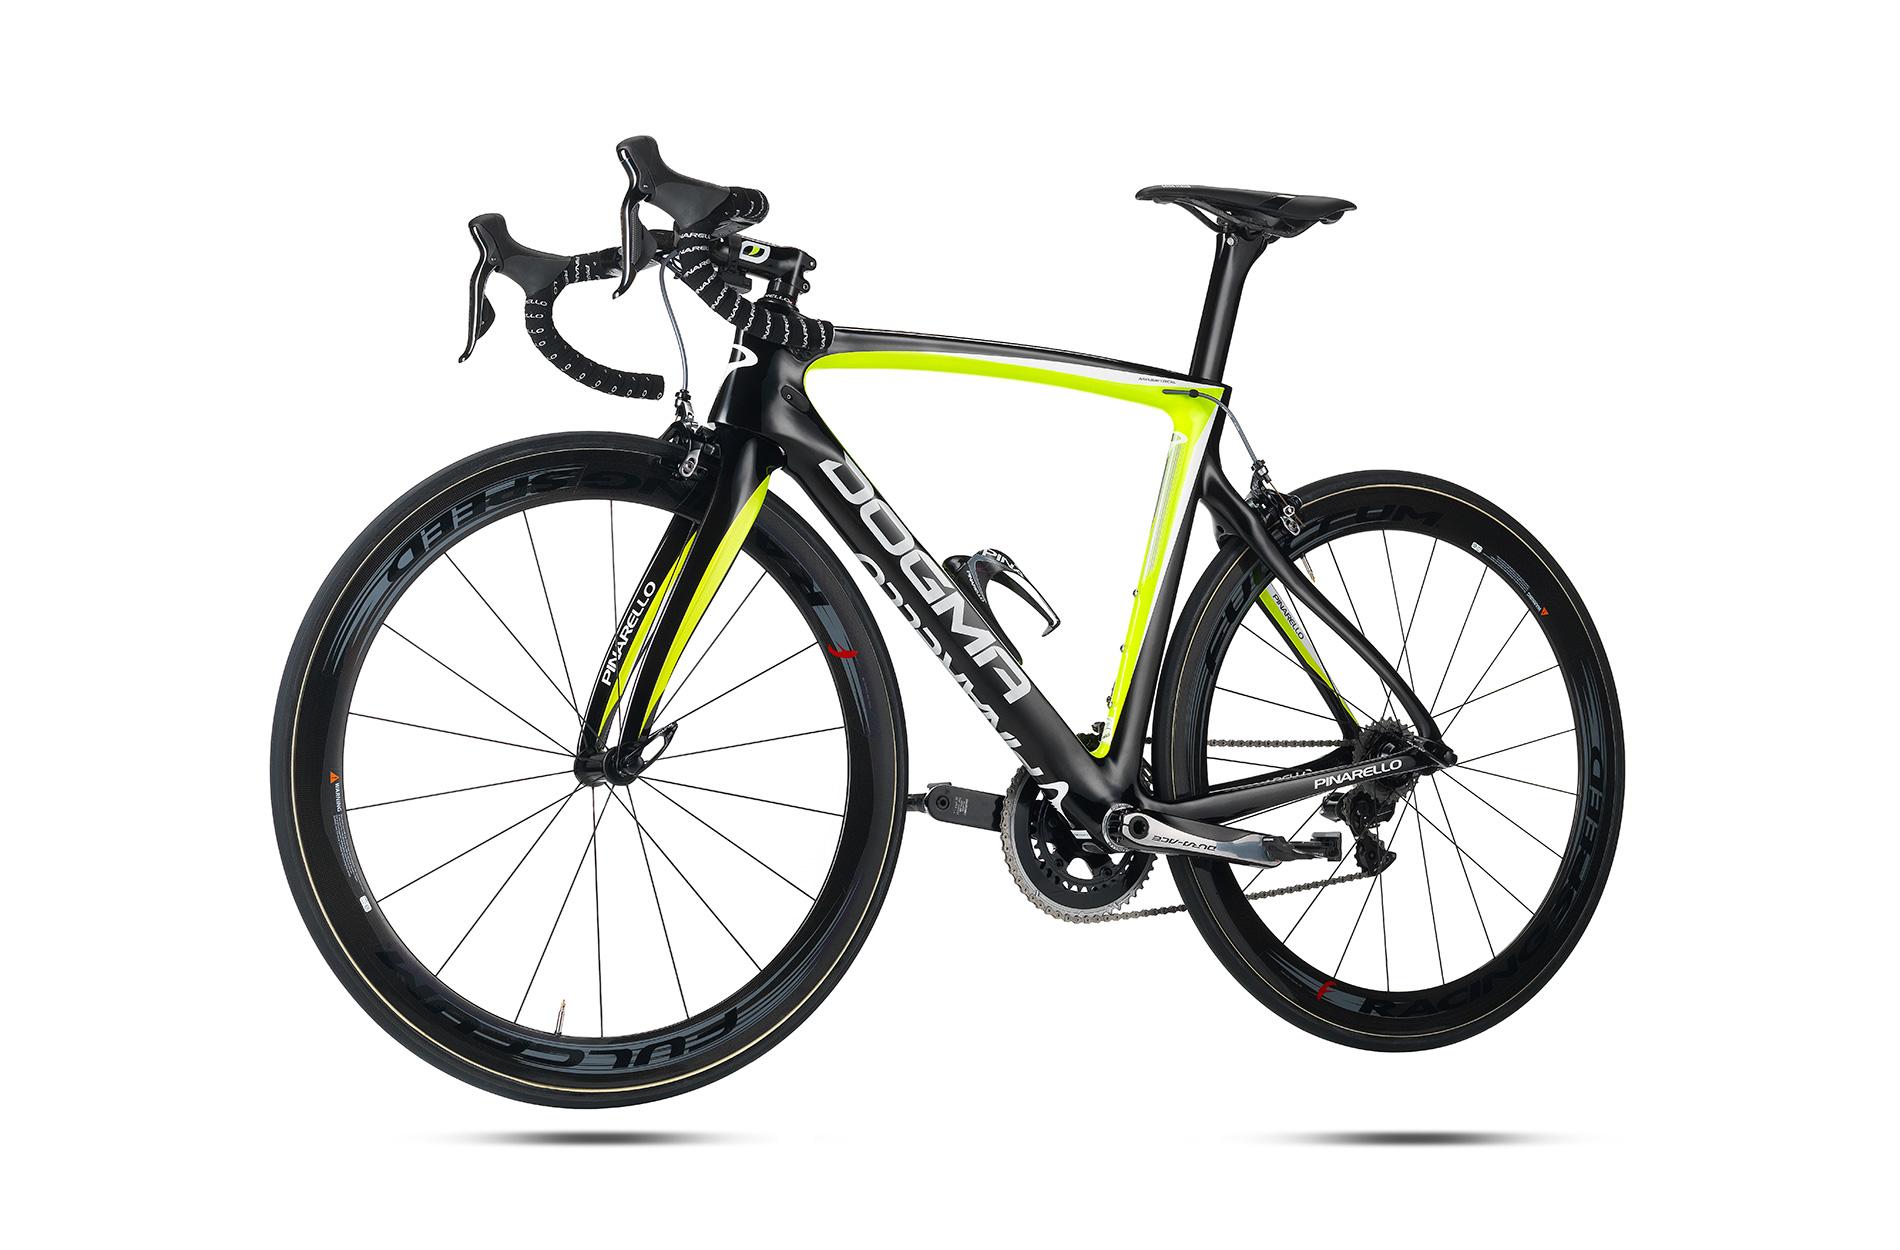 2015 Pinarello Dogma F8 FRAMESET : 953 Black / Fluo Yellow - 700